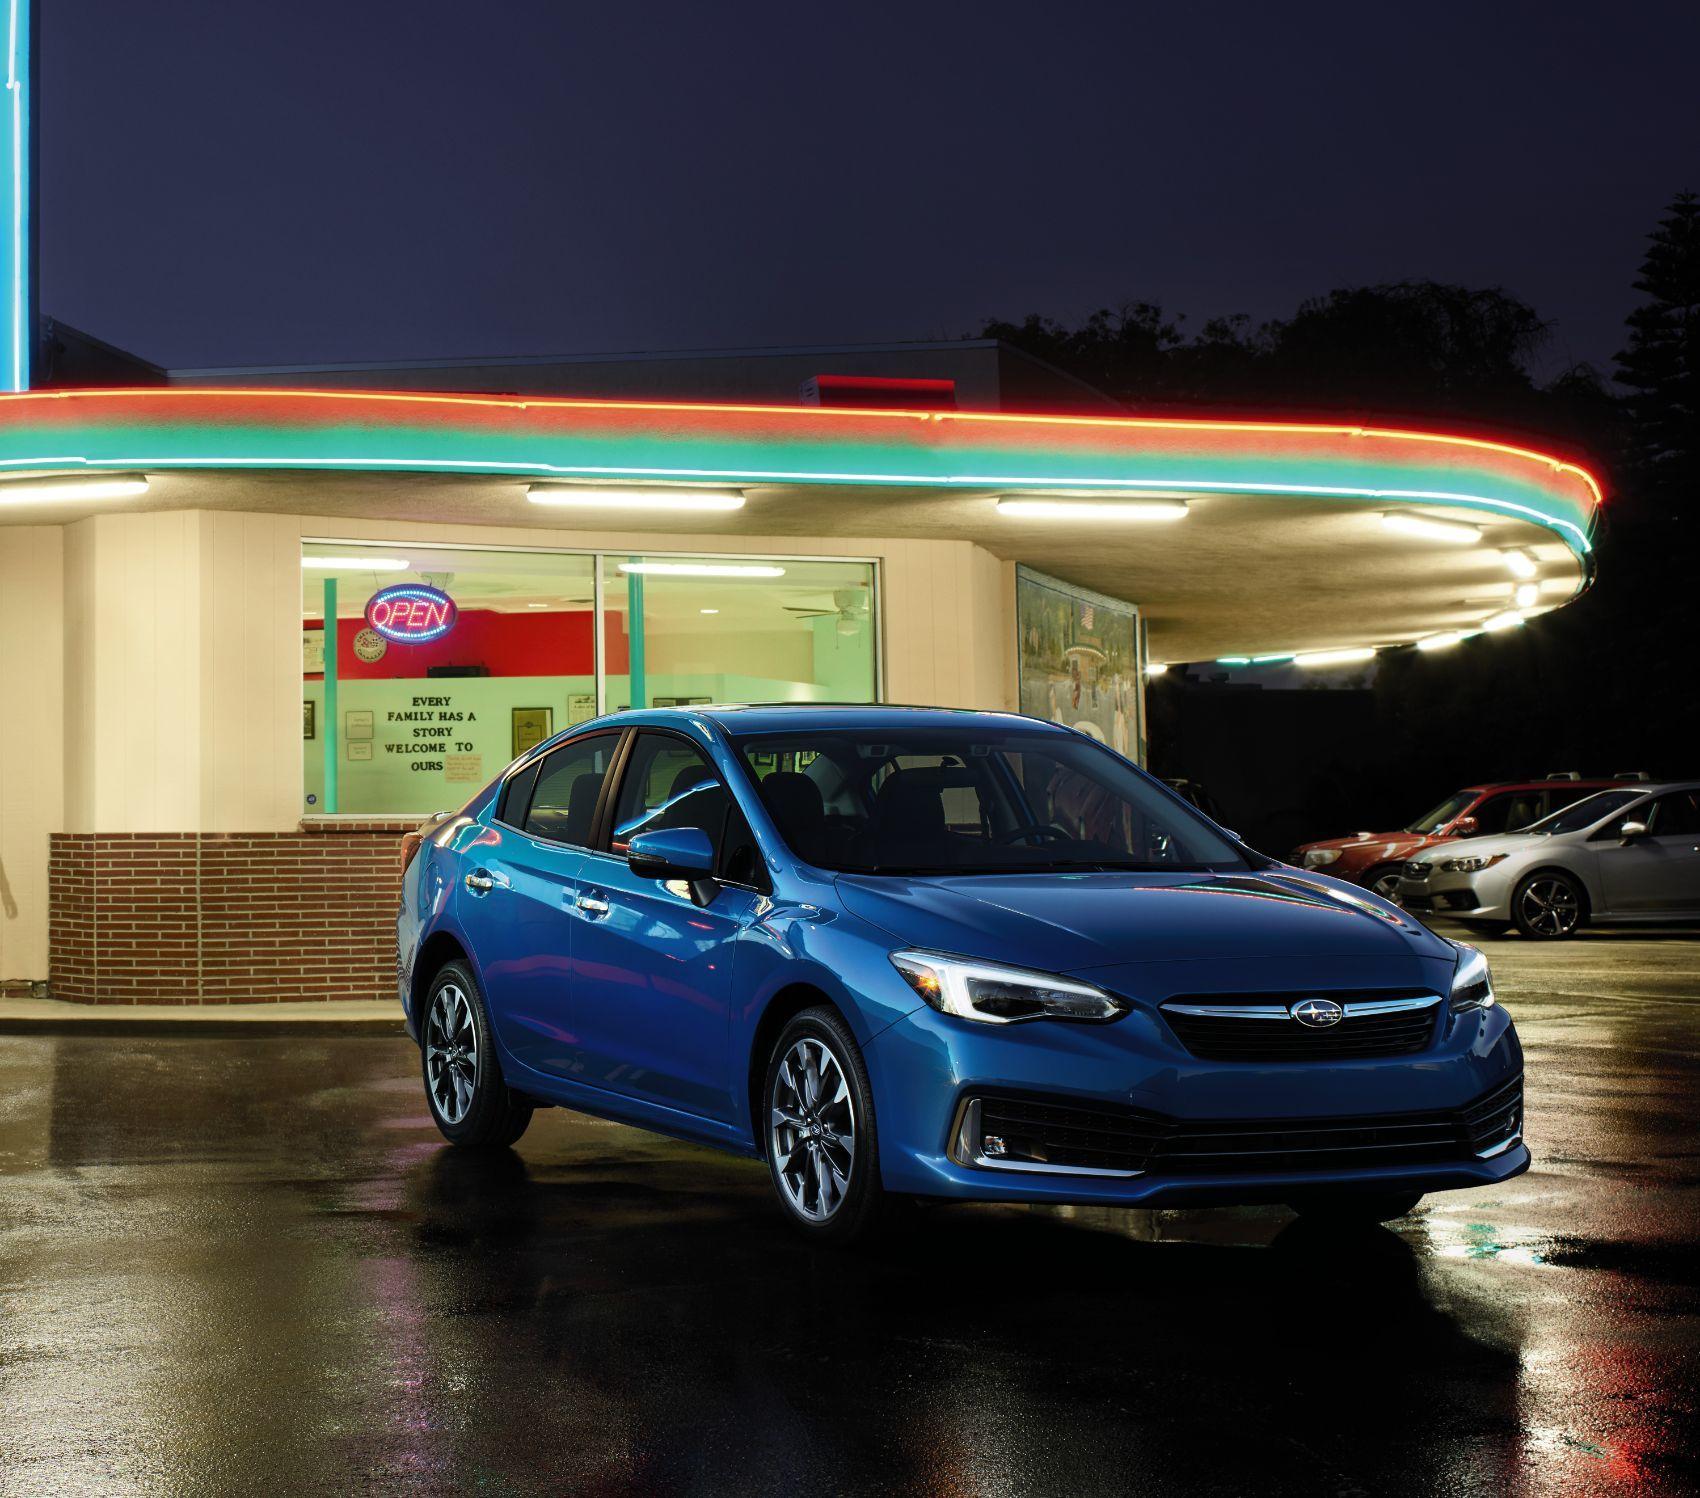 2021 subaru impreza: a complete look at the pricing & trim